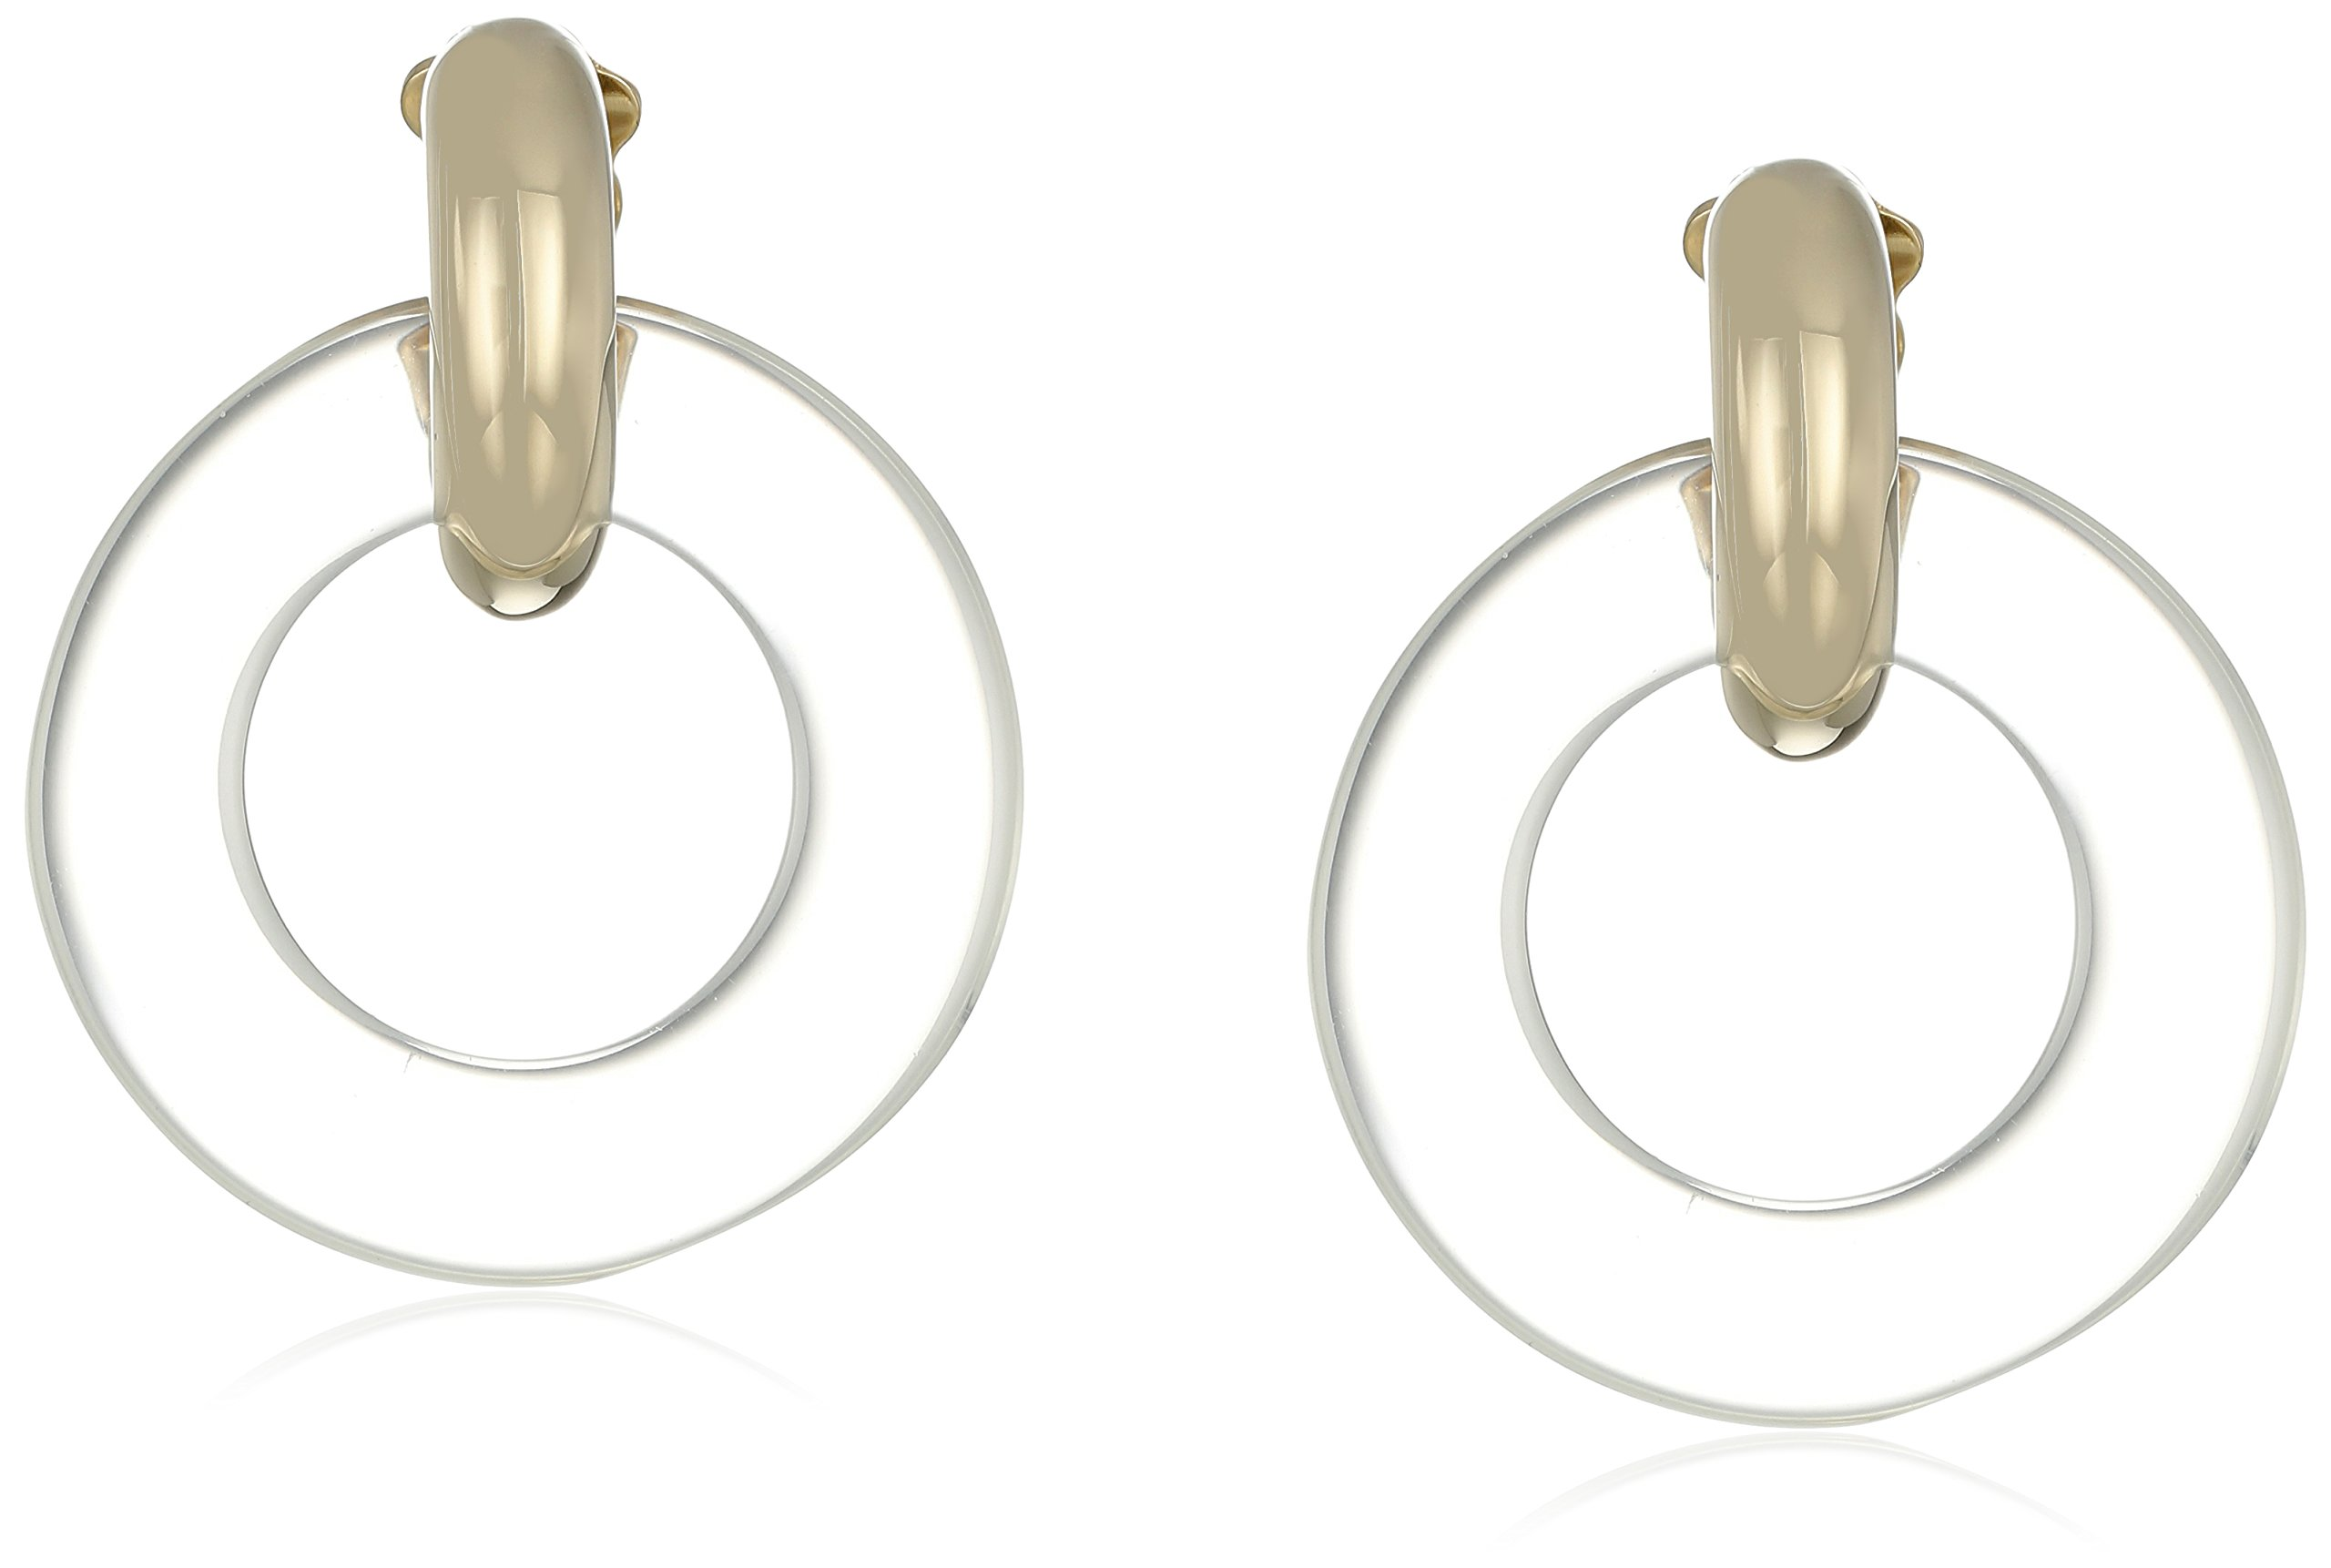 Kenneth Jay Lane Gold Top with Clear Doorknocker Clip-On Earrings